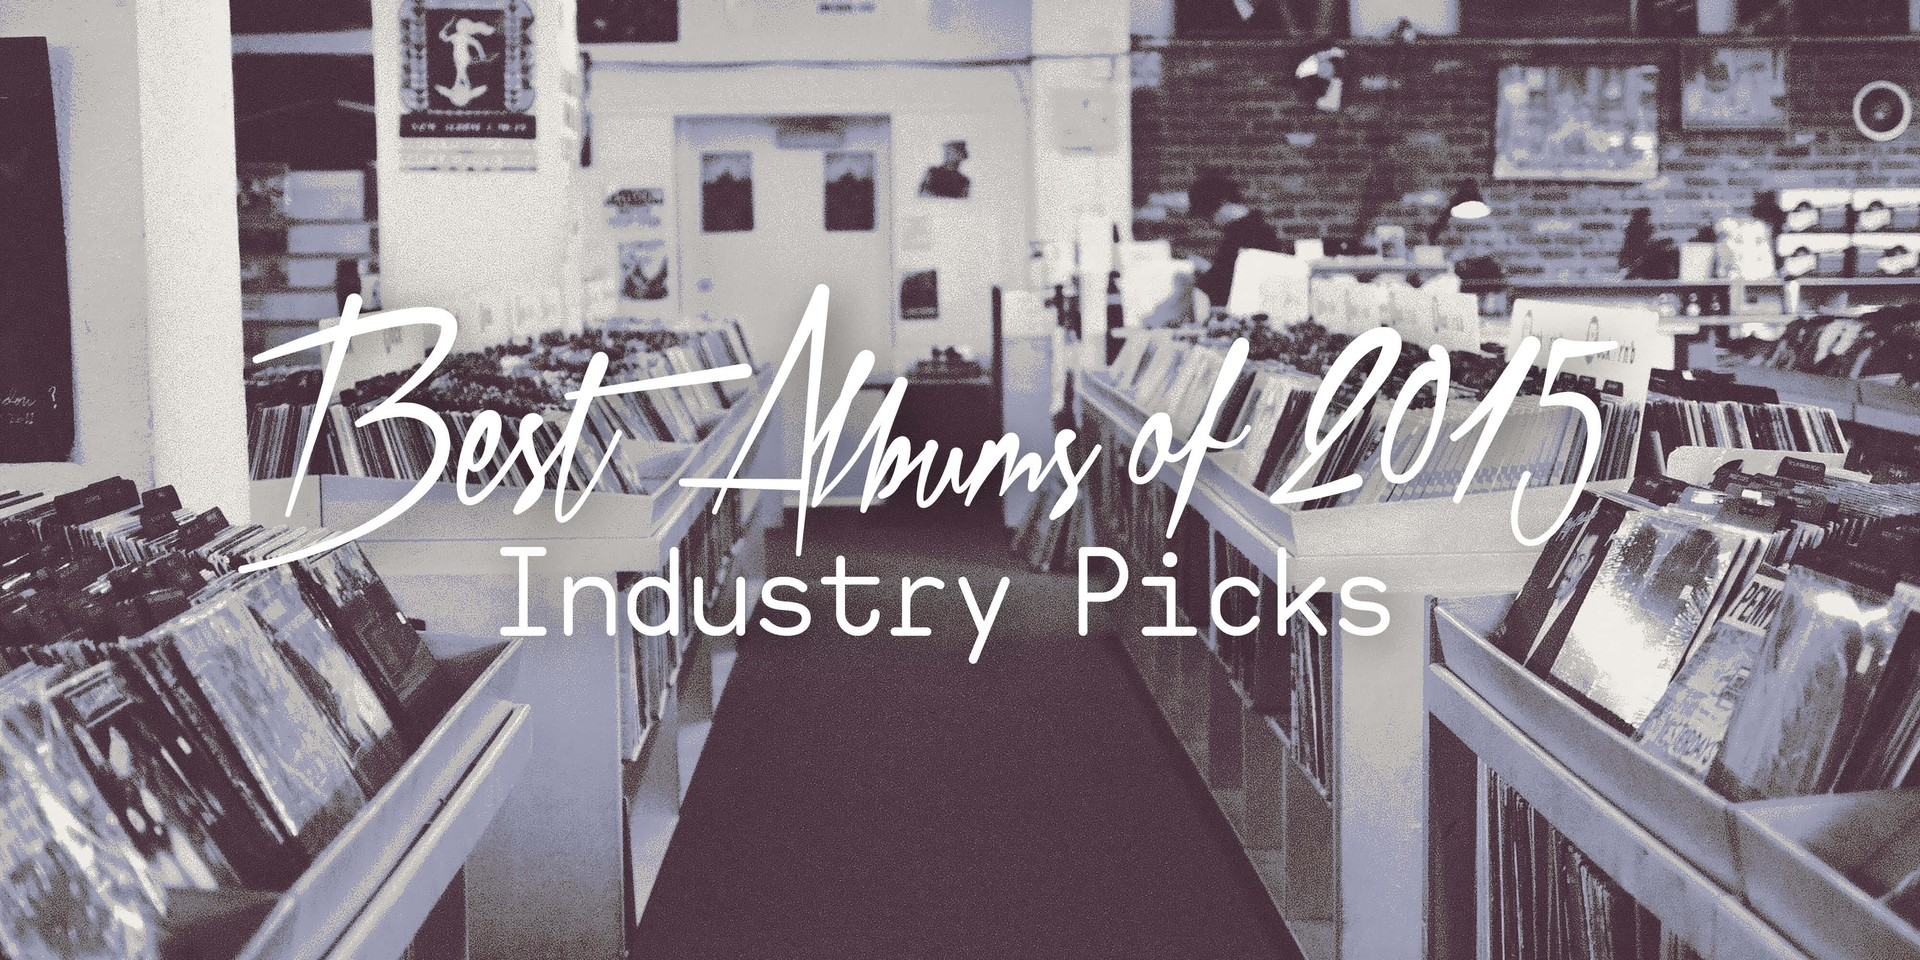 Best Albums of 2015: Industry Picks